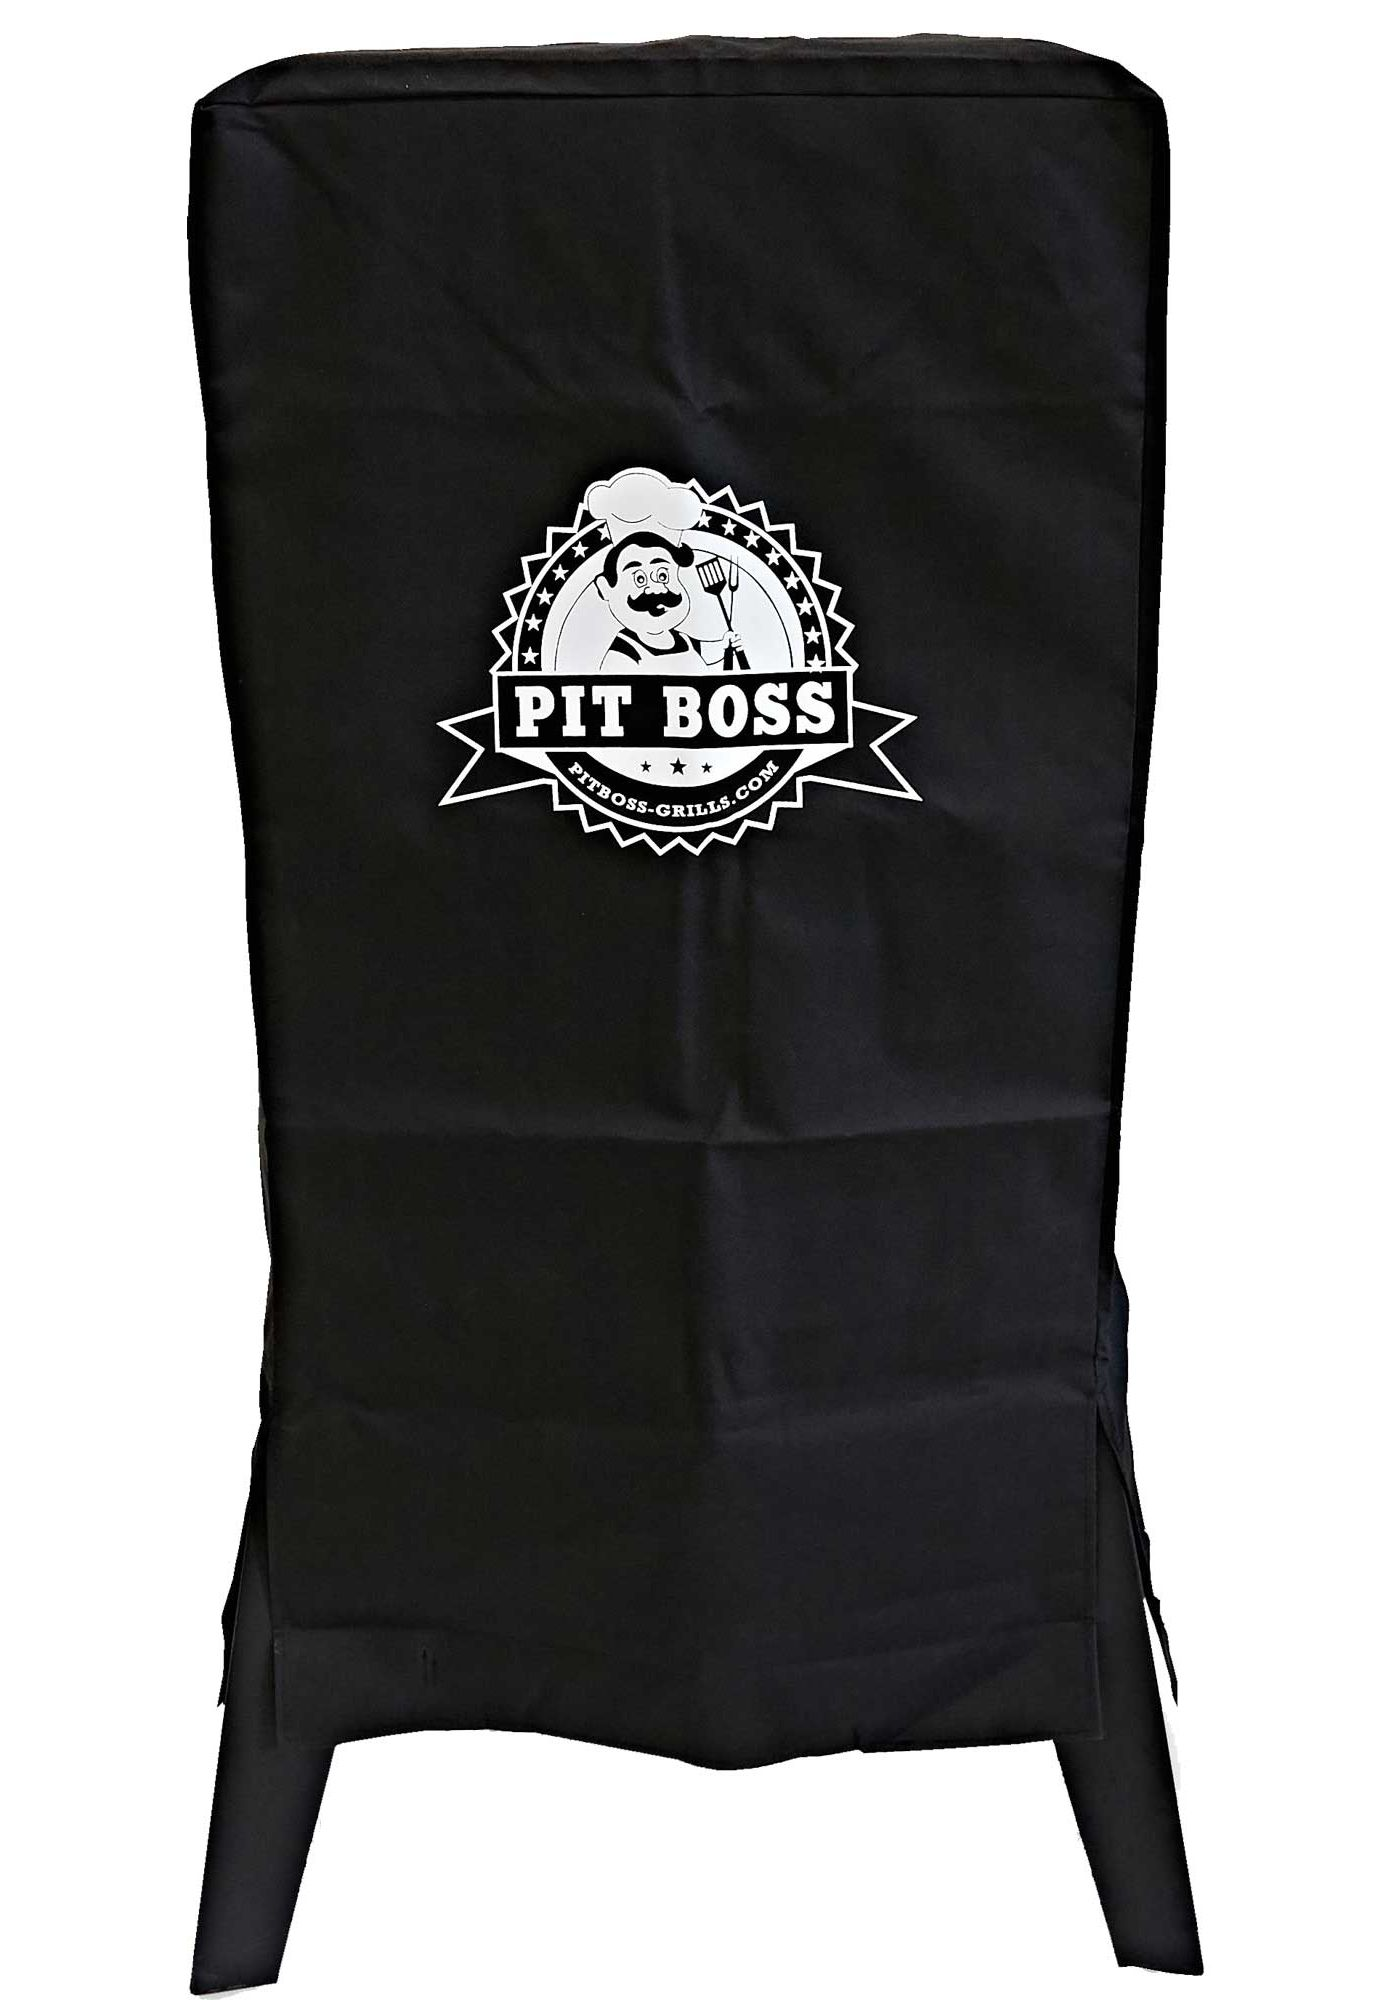 Pit Boss 2 Series Analog/Digital Smoker Cover